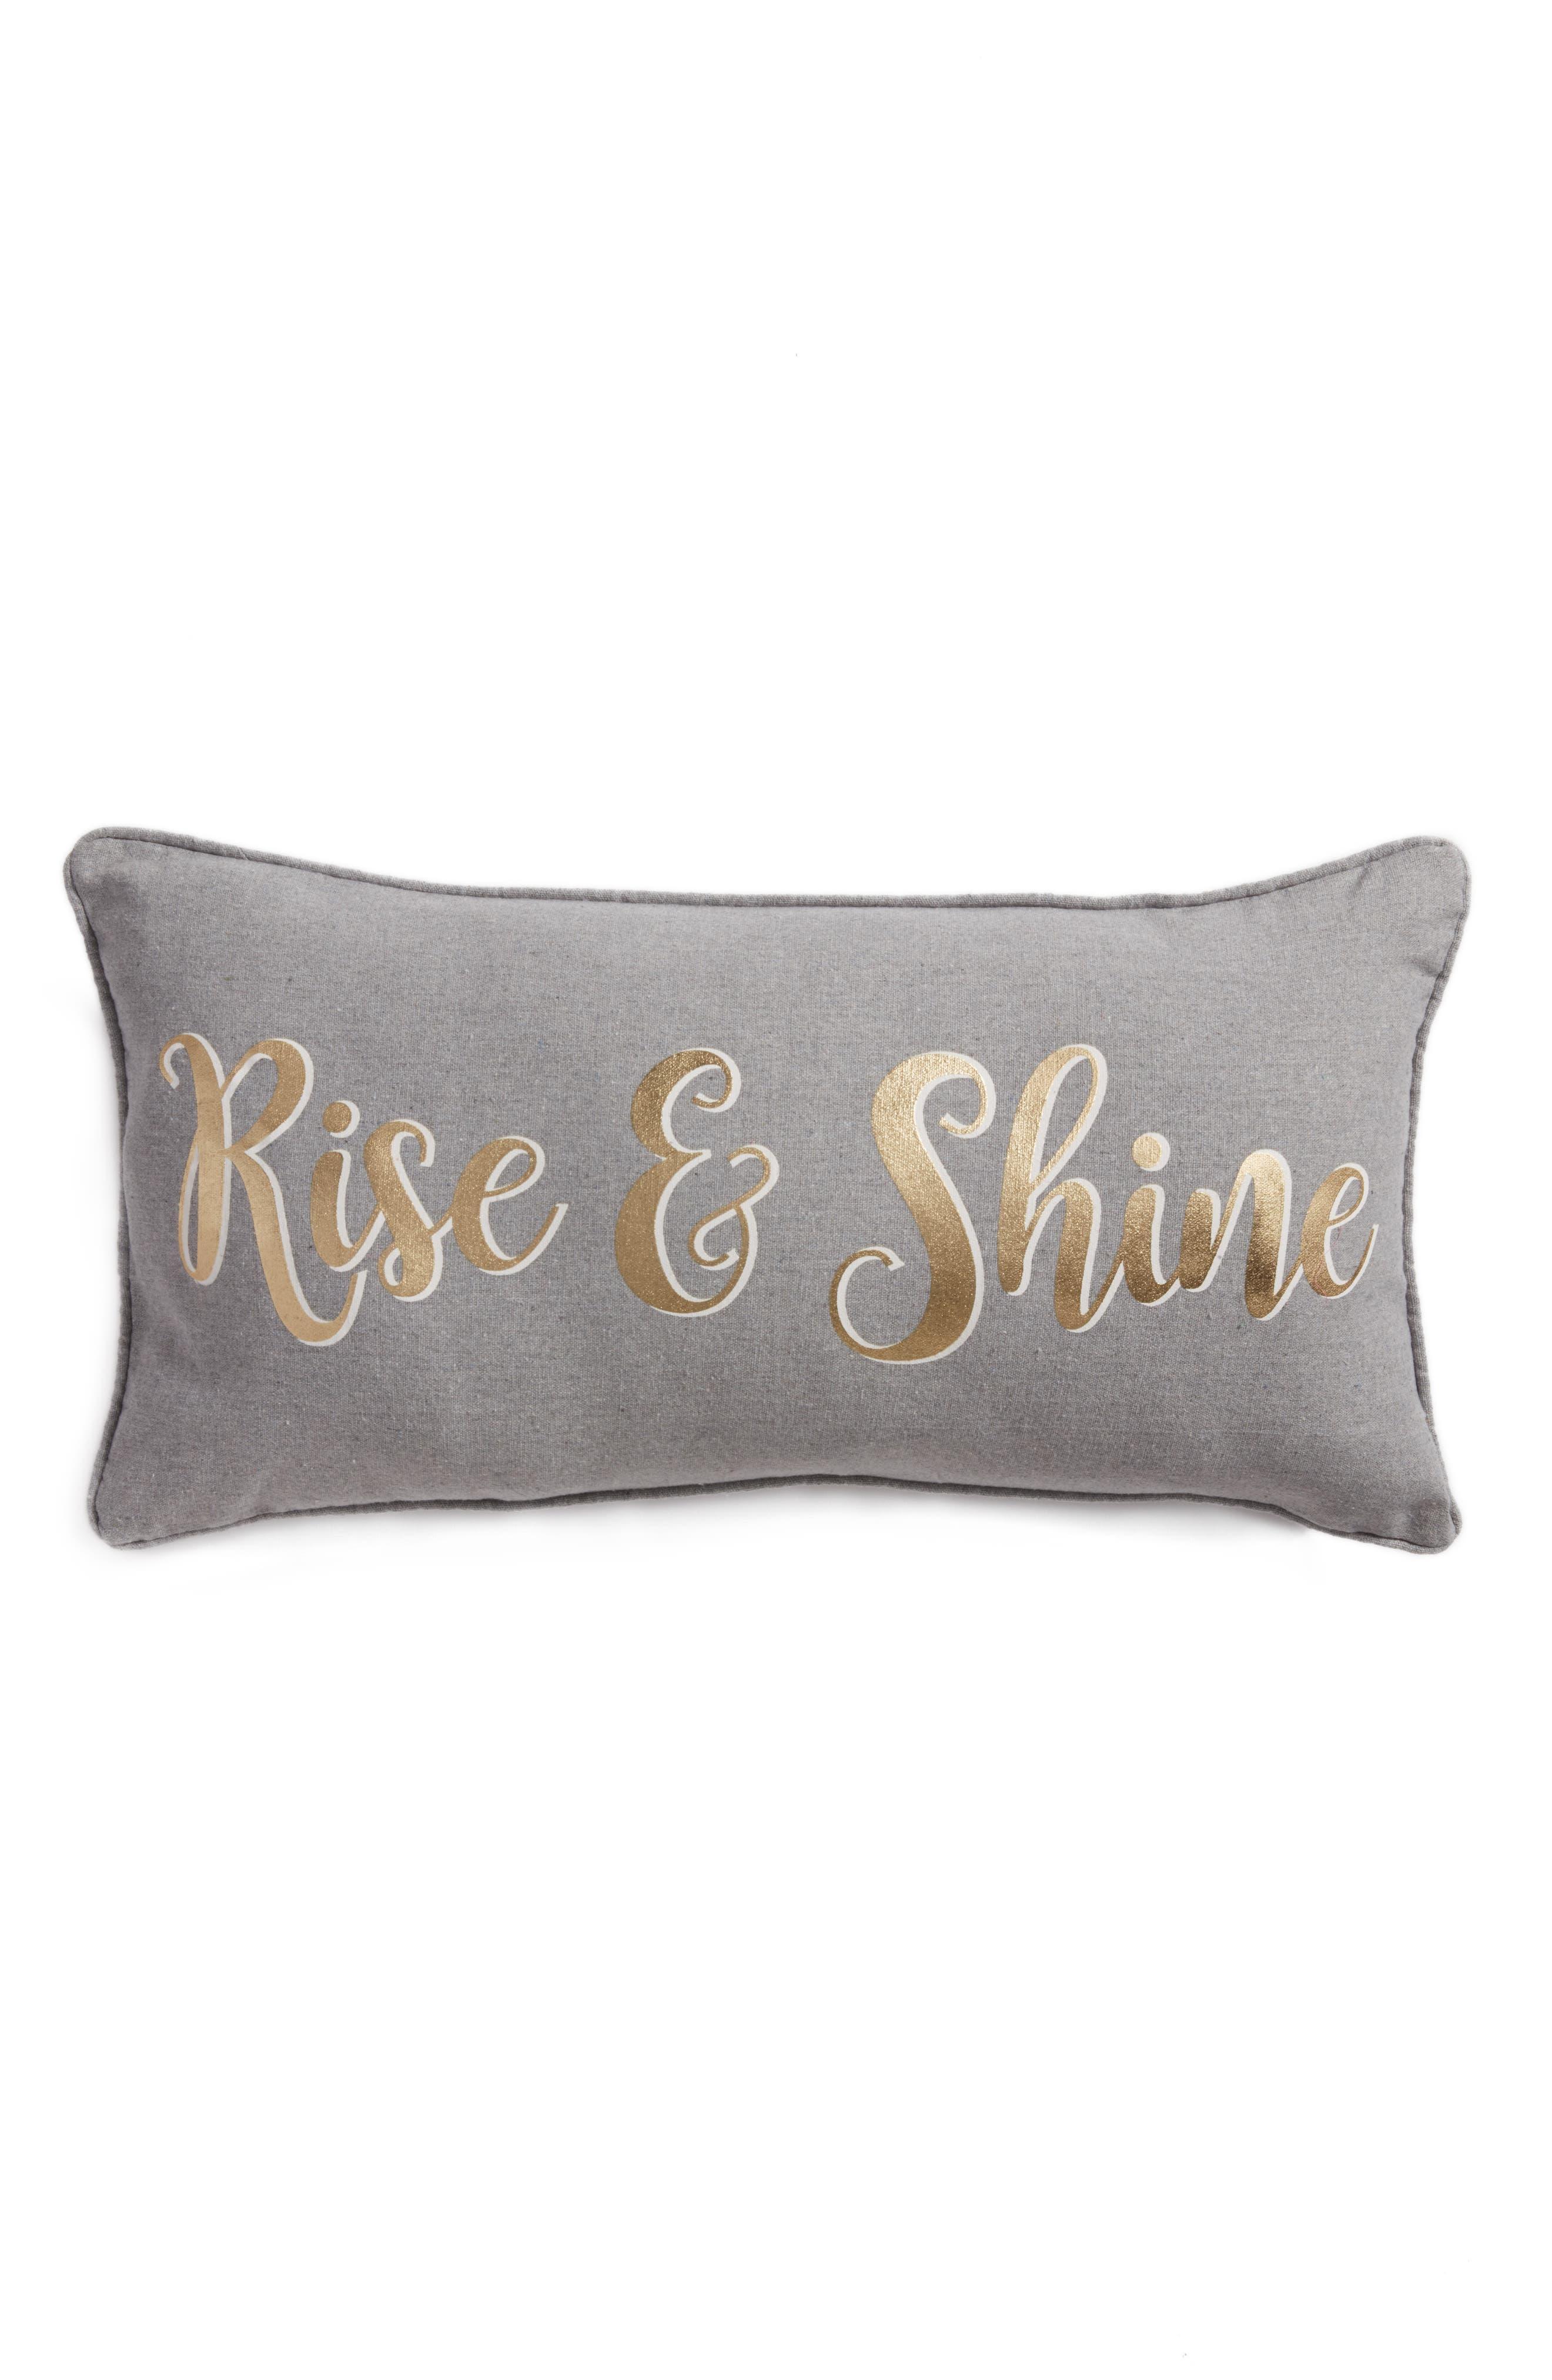 Arden Rise & Shine Accent Pillow,                             Main thumbnail 1, color,                             020